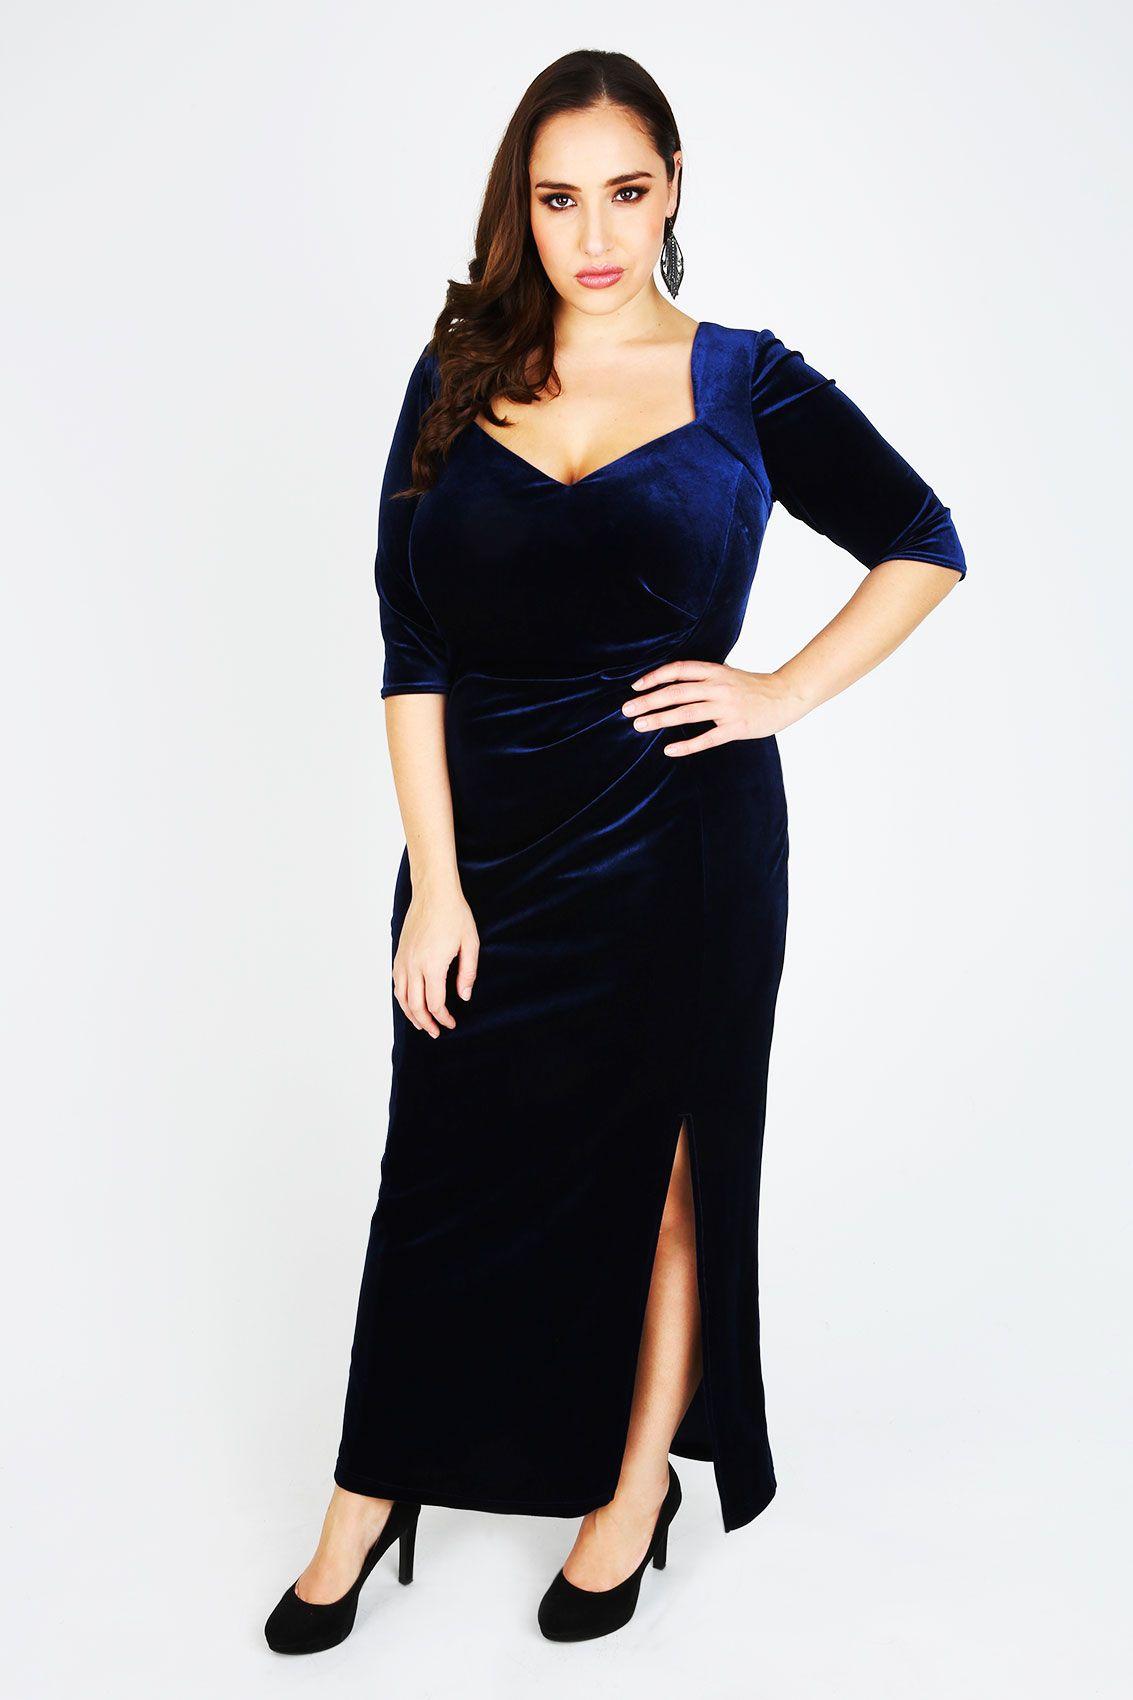 SCARLETT & JO Midnight Blue Velvet Maxi Dress | Jada Sezer (Yours ...